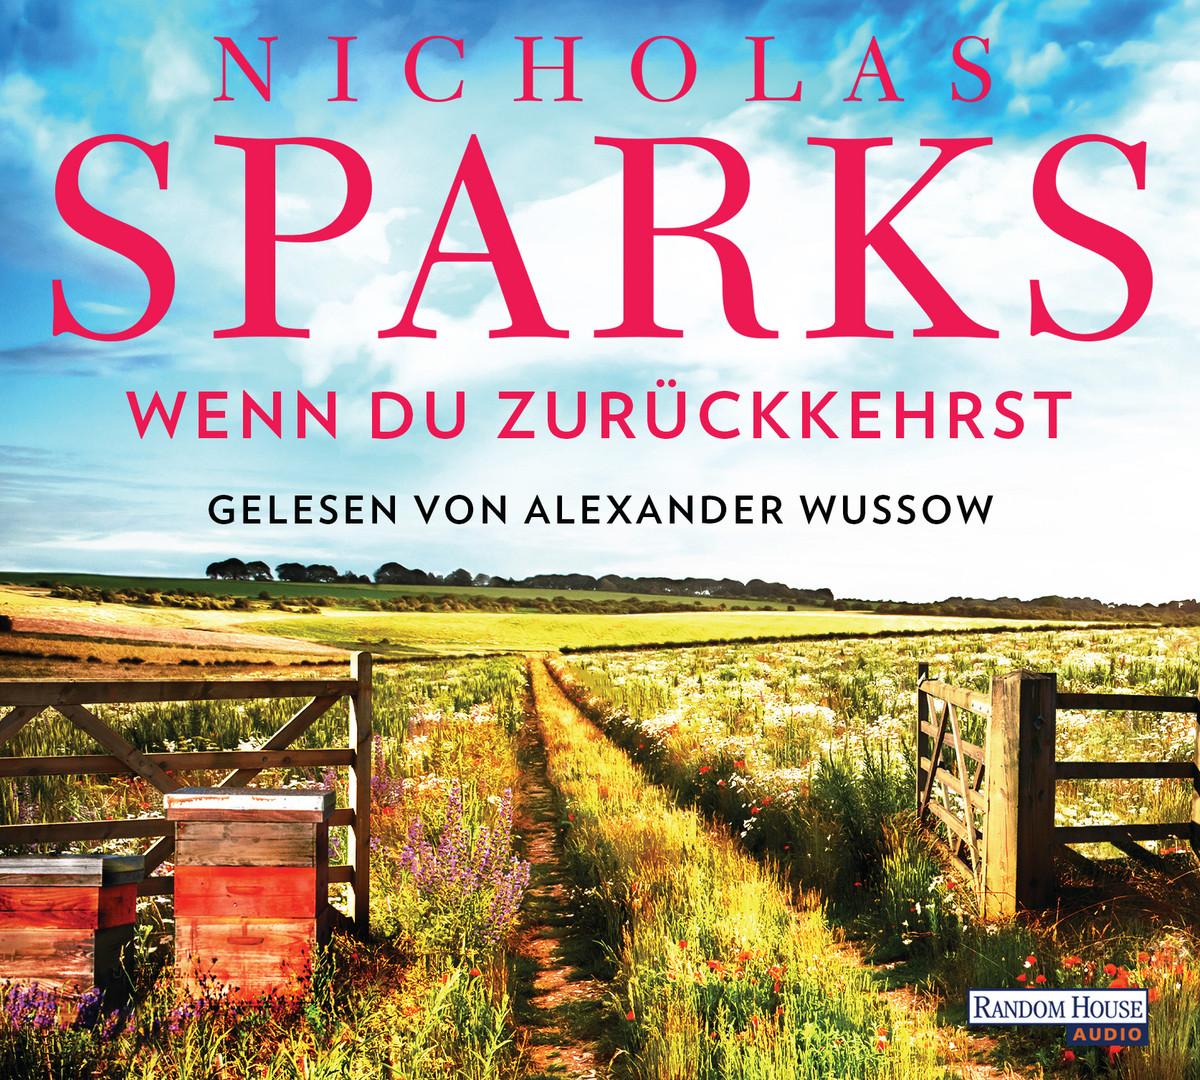 Nicholas Sparks - Wenn du zurückkehrst